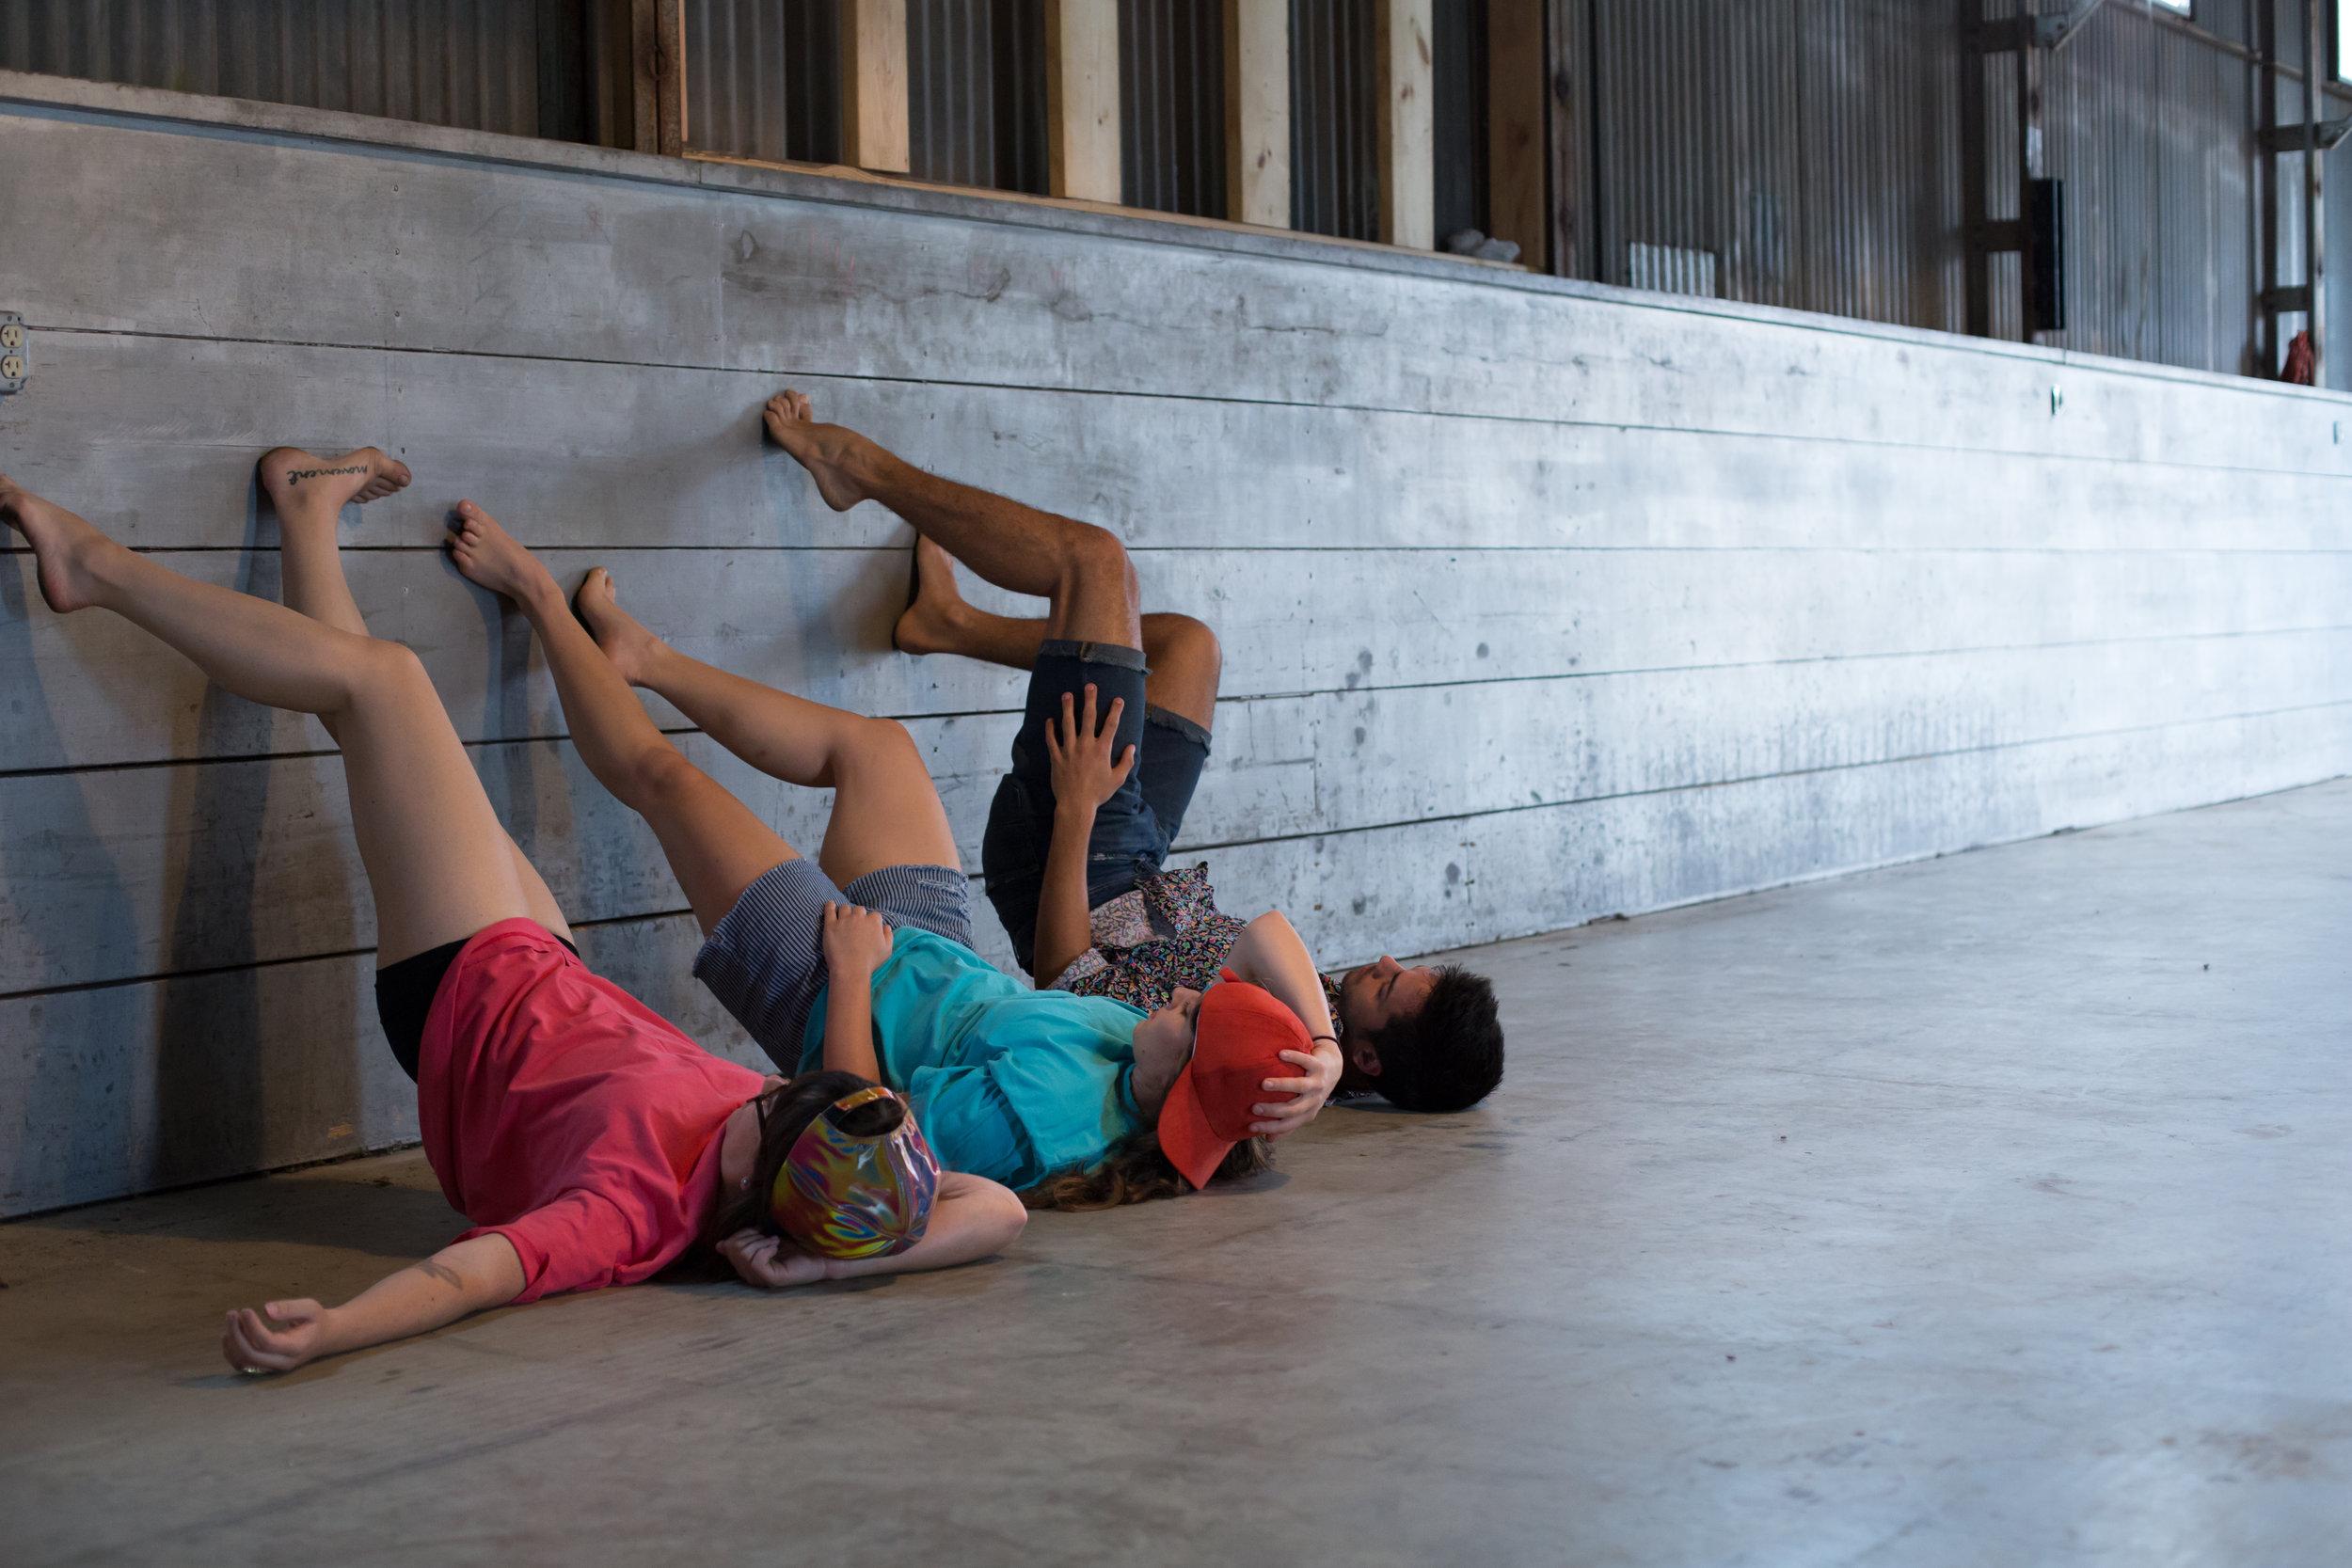 Dancers: Maggie Bailey, Jenny Alperin, Clay Moore